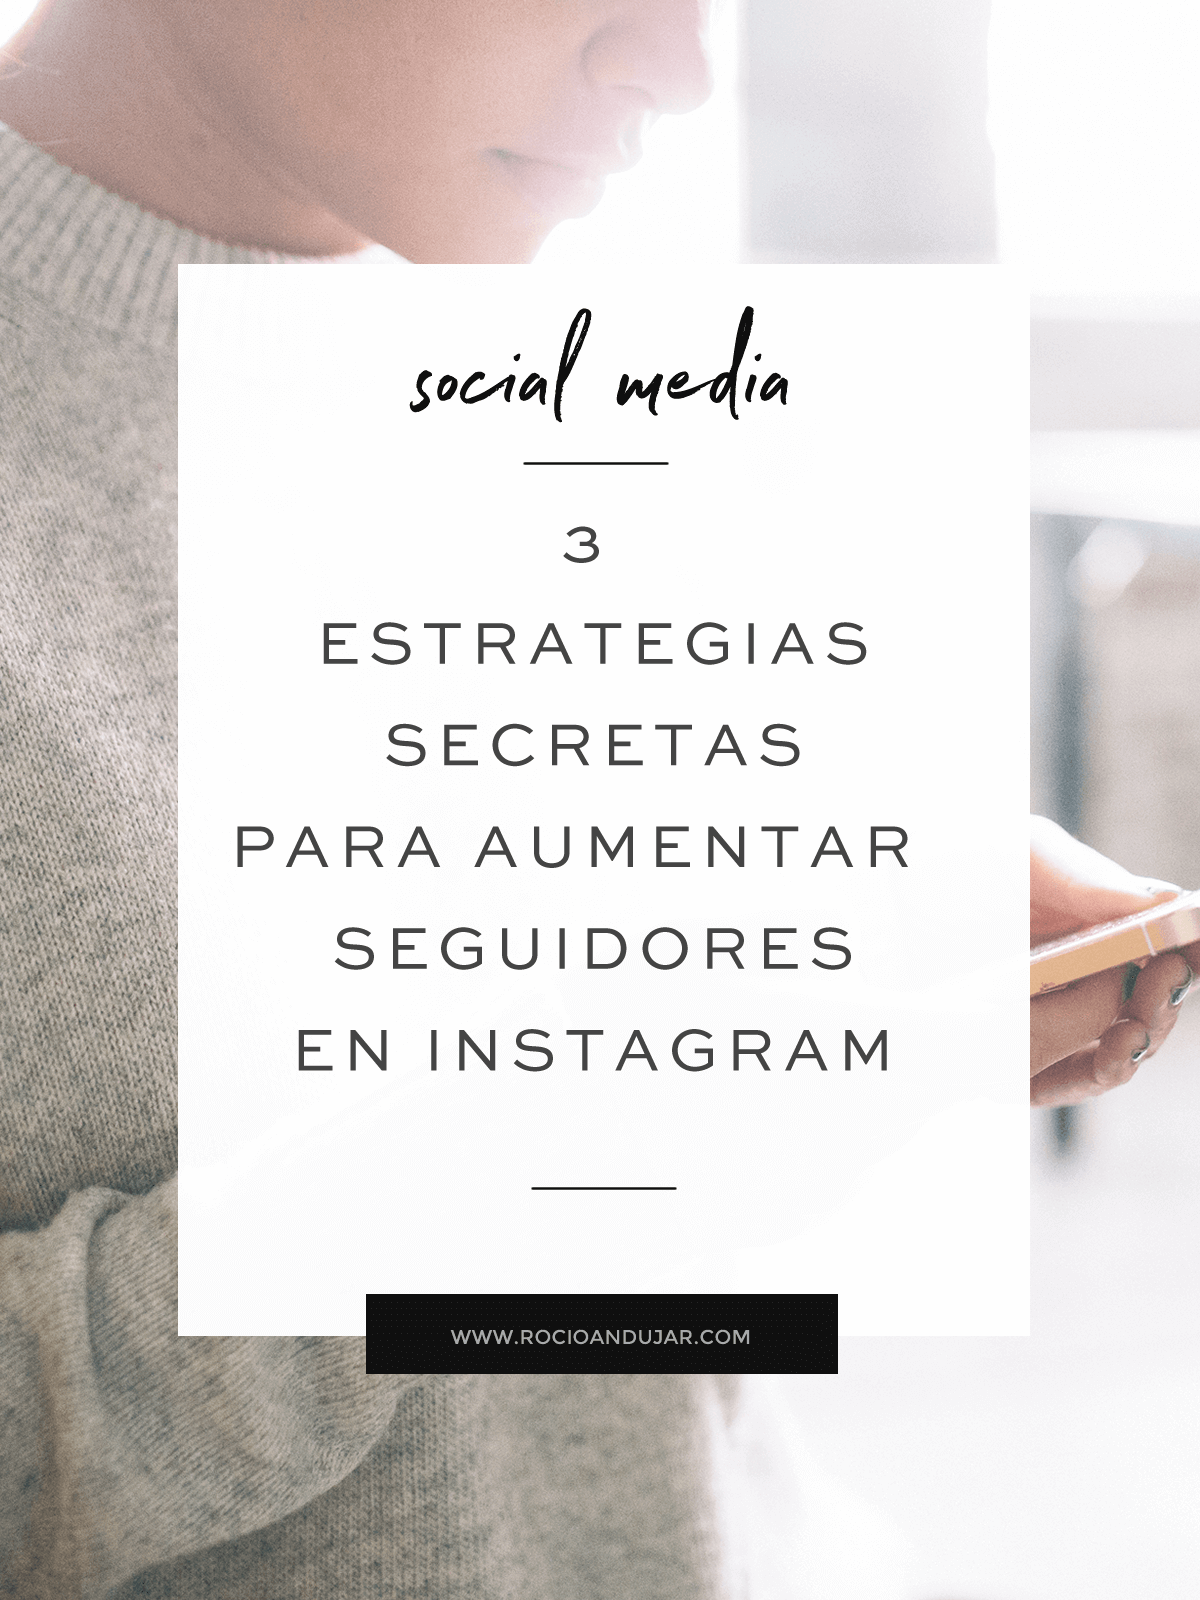 e estrategias para aumentar seguidores en instagram